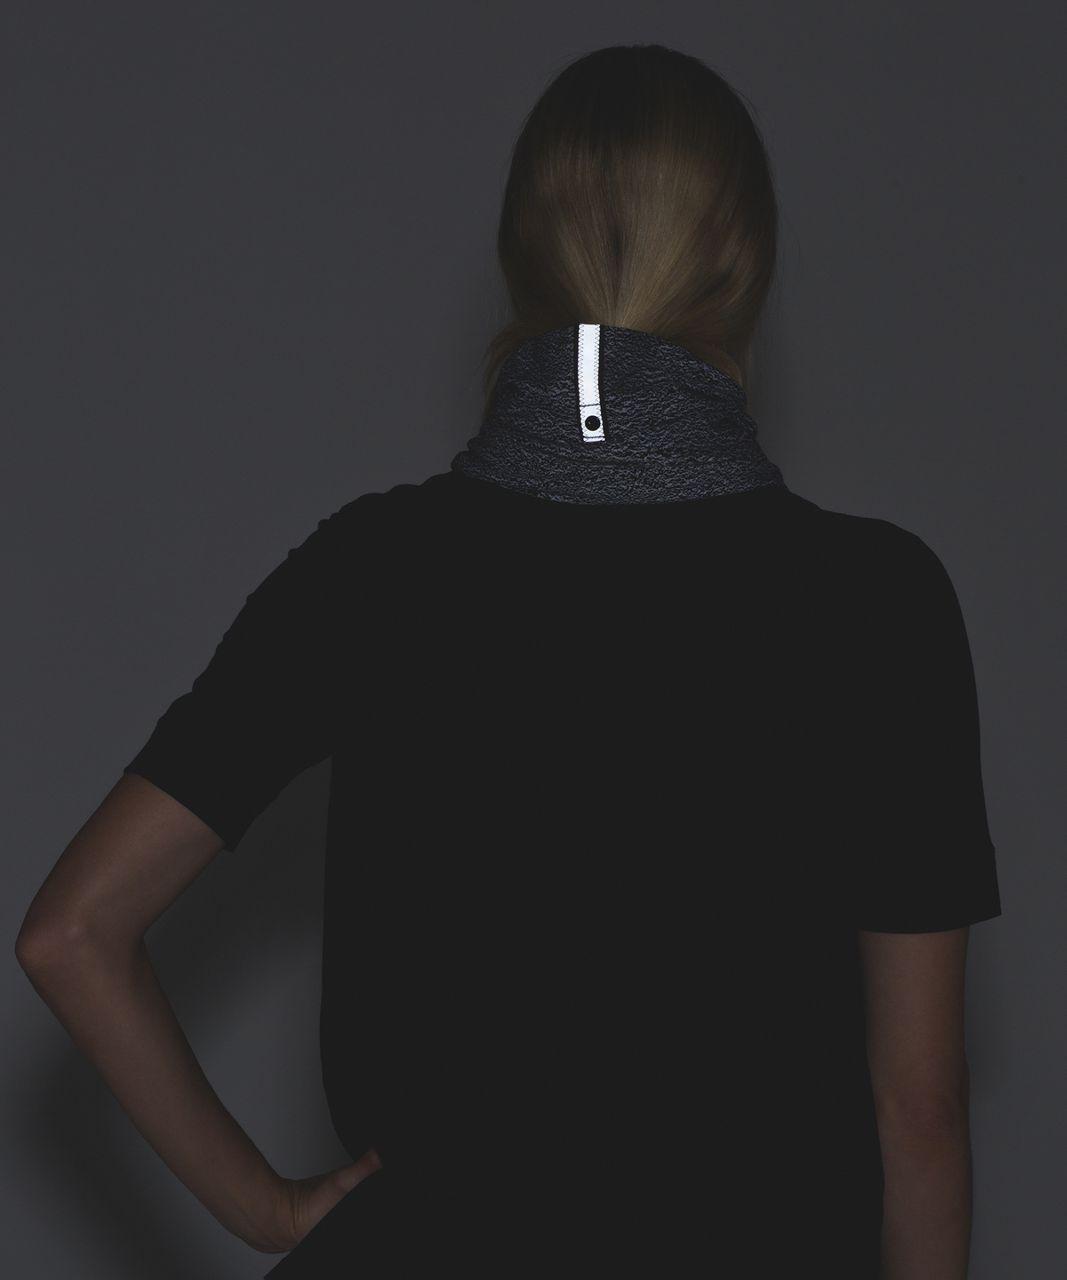 Lululemon Vinyasa Scarf *Rulu - Running Luon Spray Jacquard White Black / Black